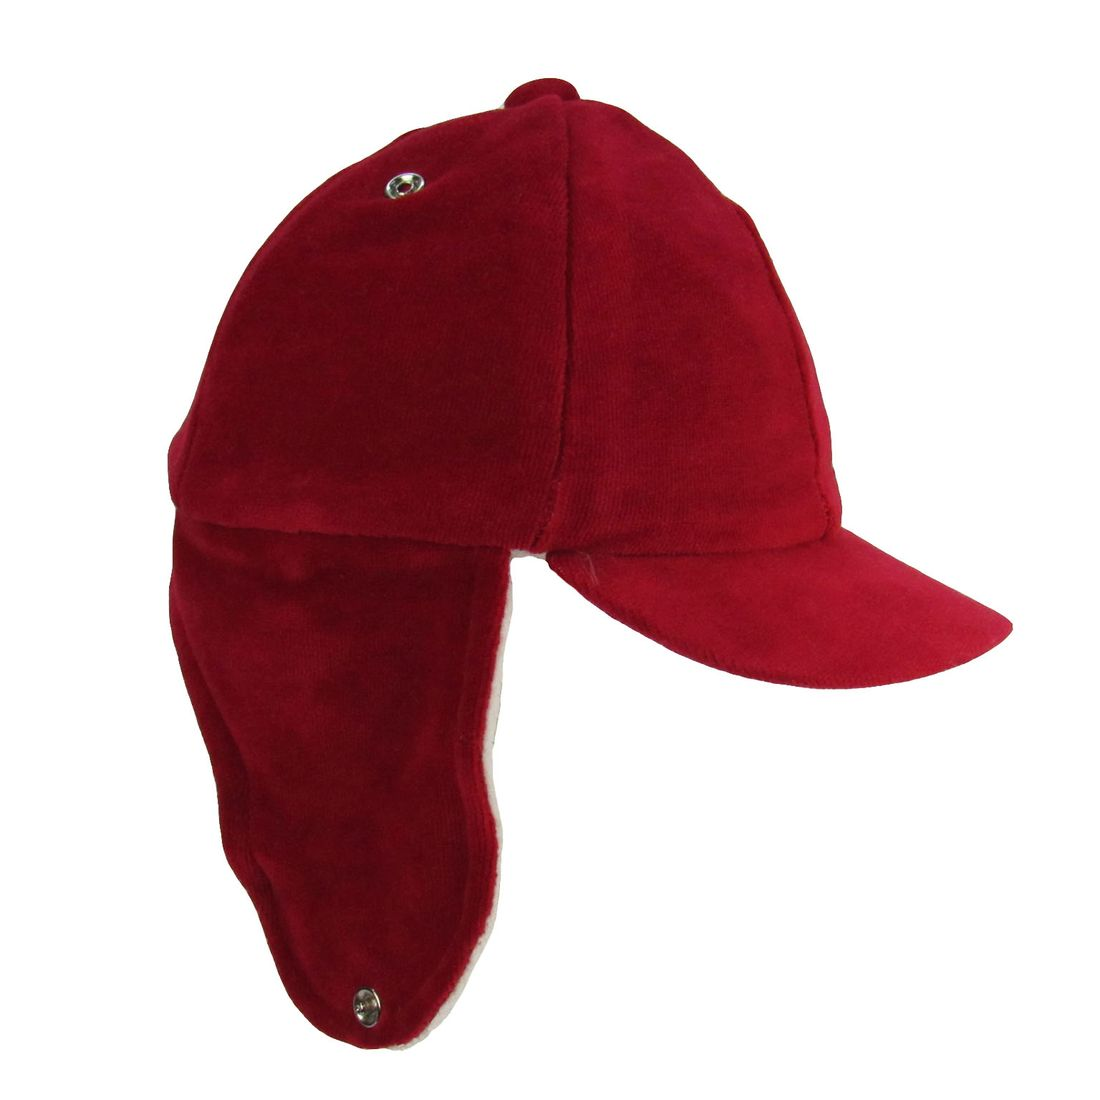 Boné Bebê Masculino Plush Vermelho e Branco - poetique ed265b2ab74